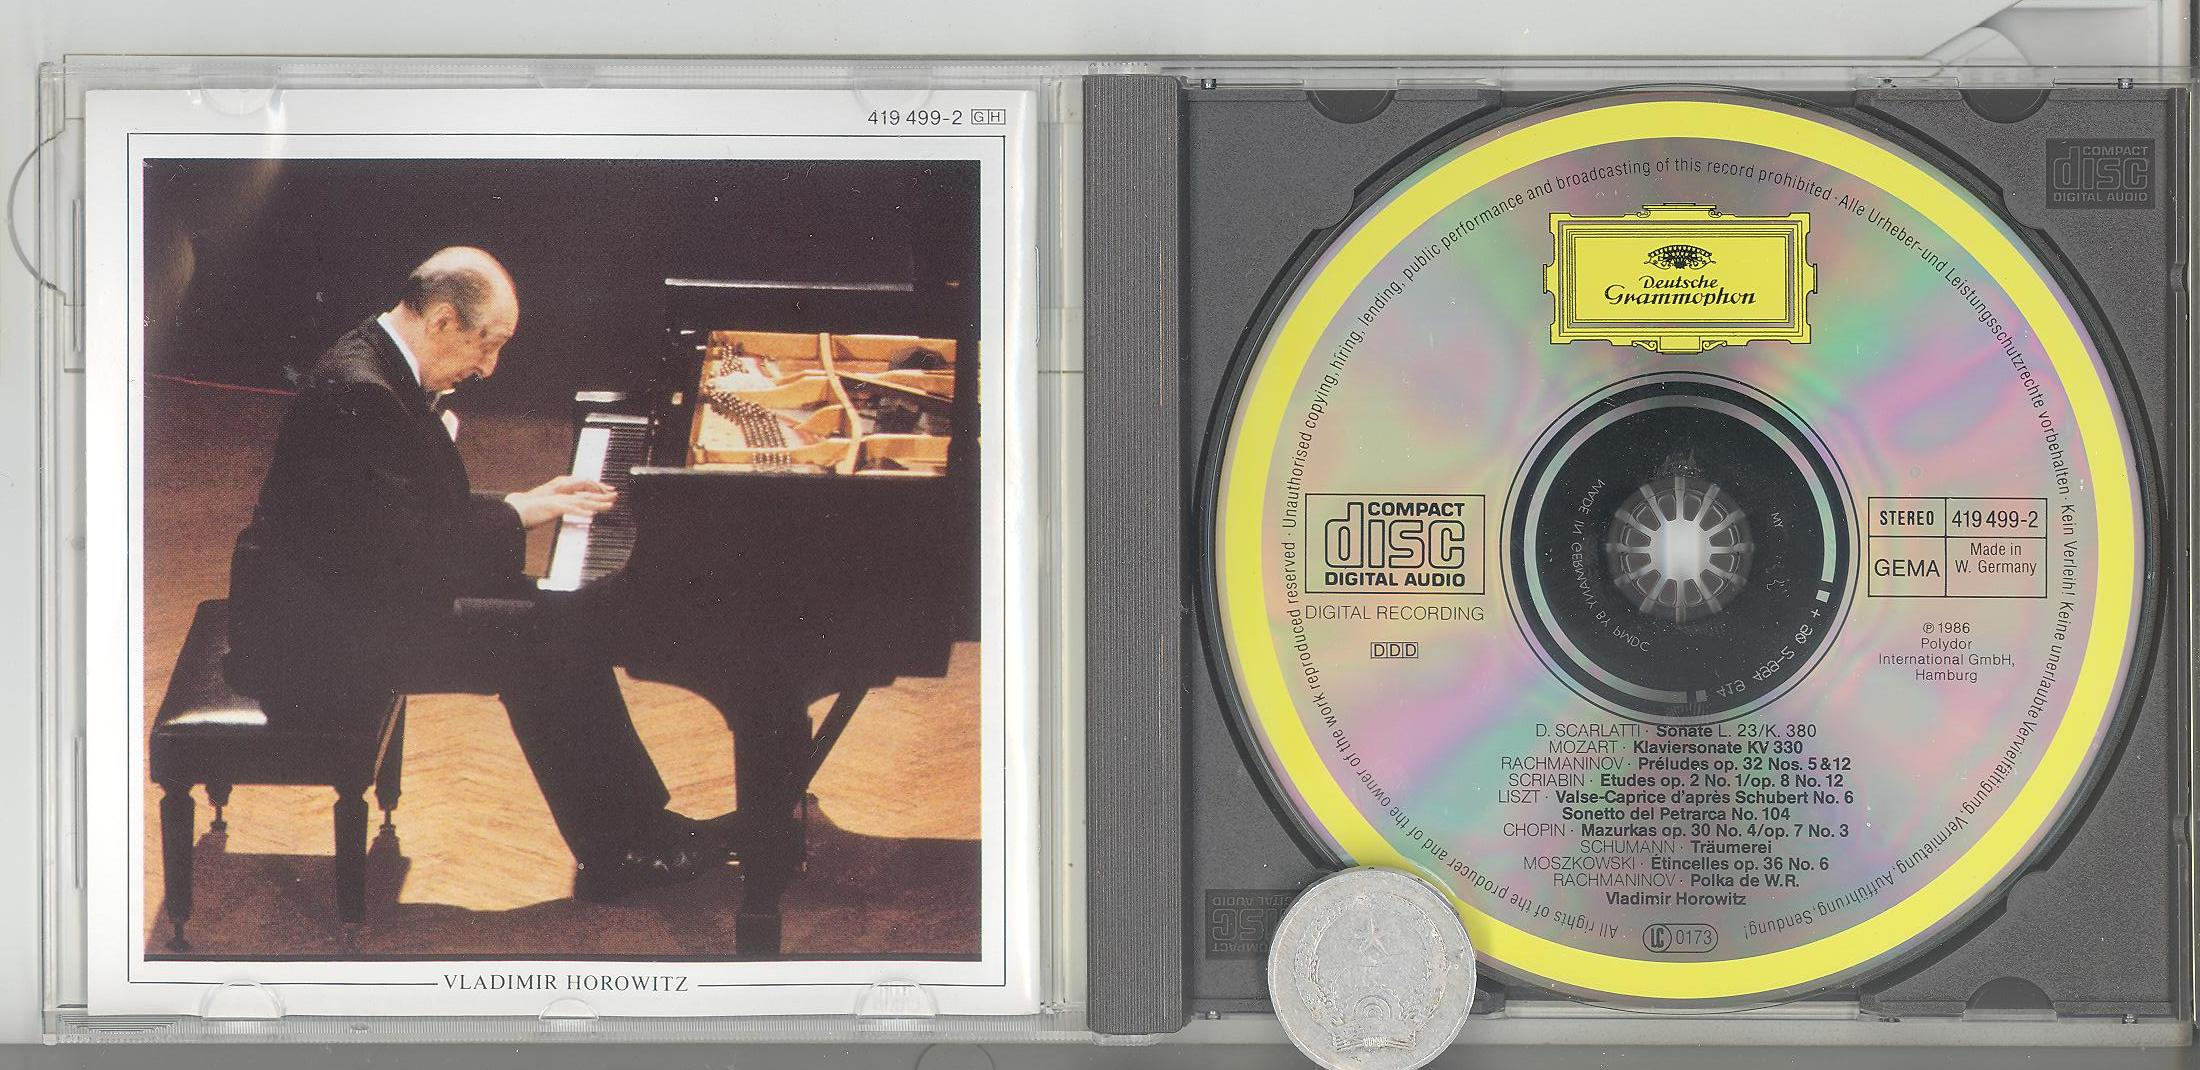 stereomate - Đĩa nhạc - CD gốc: Horowitz - In Moscow